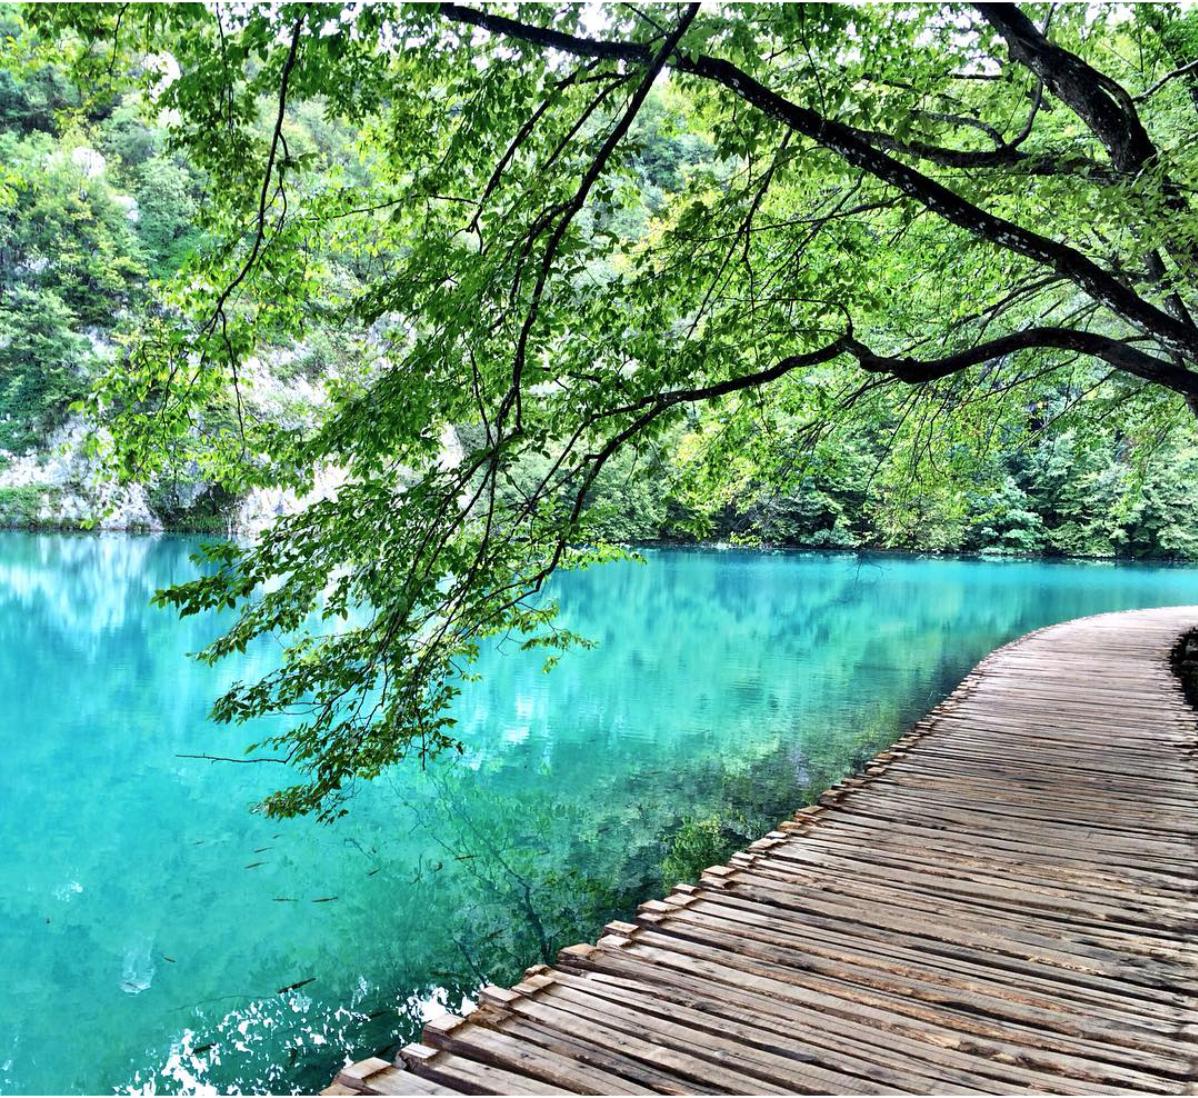 Plivtice Croacia - Viajei de carro, ônibus e barco